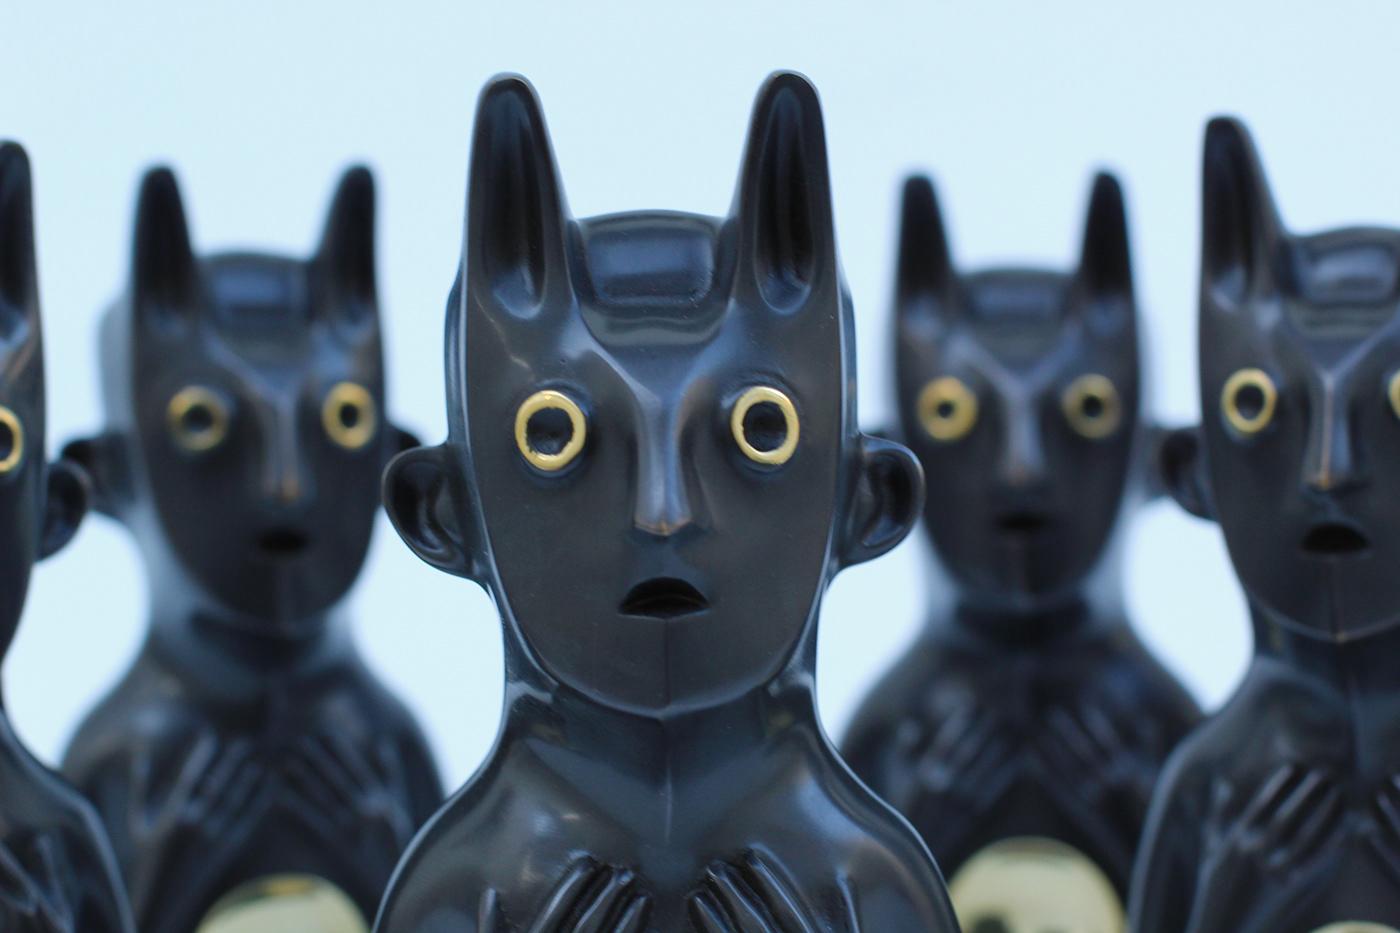 3dprint bronze sculpture sculpture tocooco Zbrush